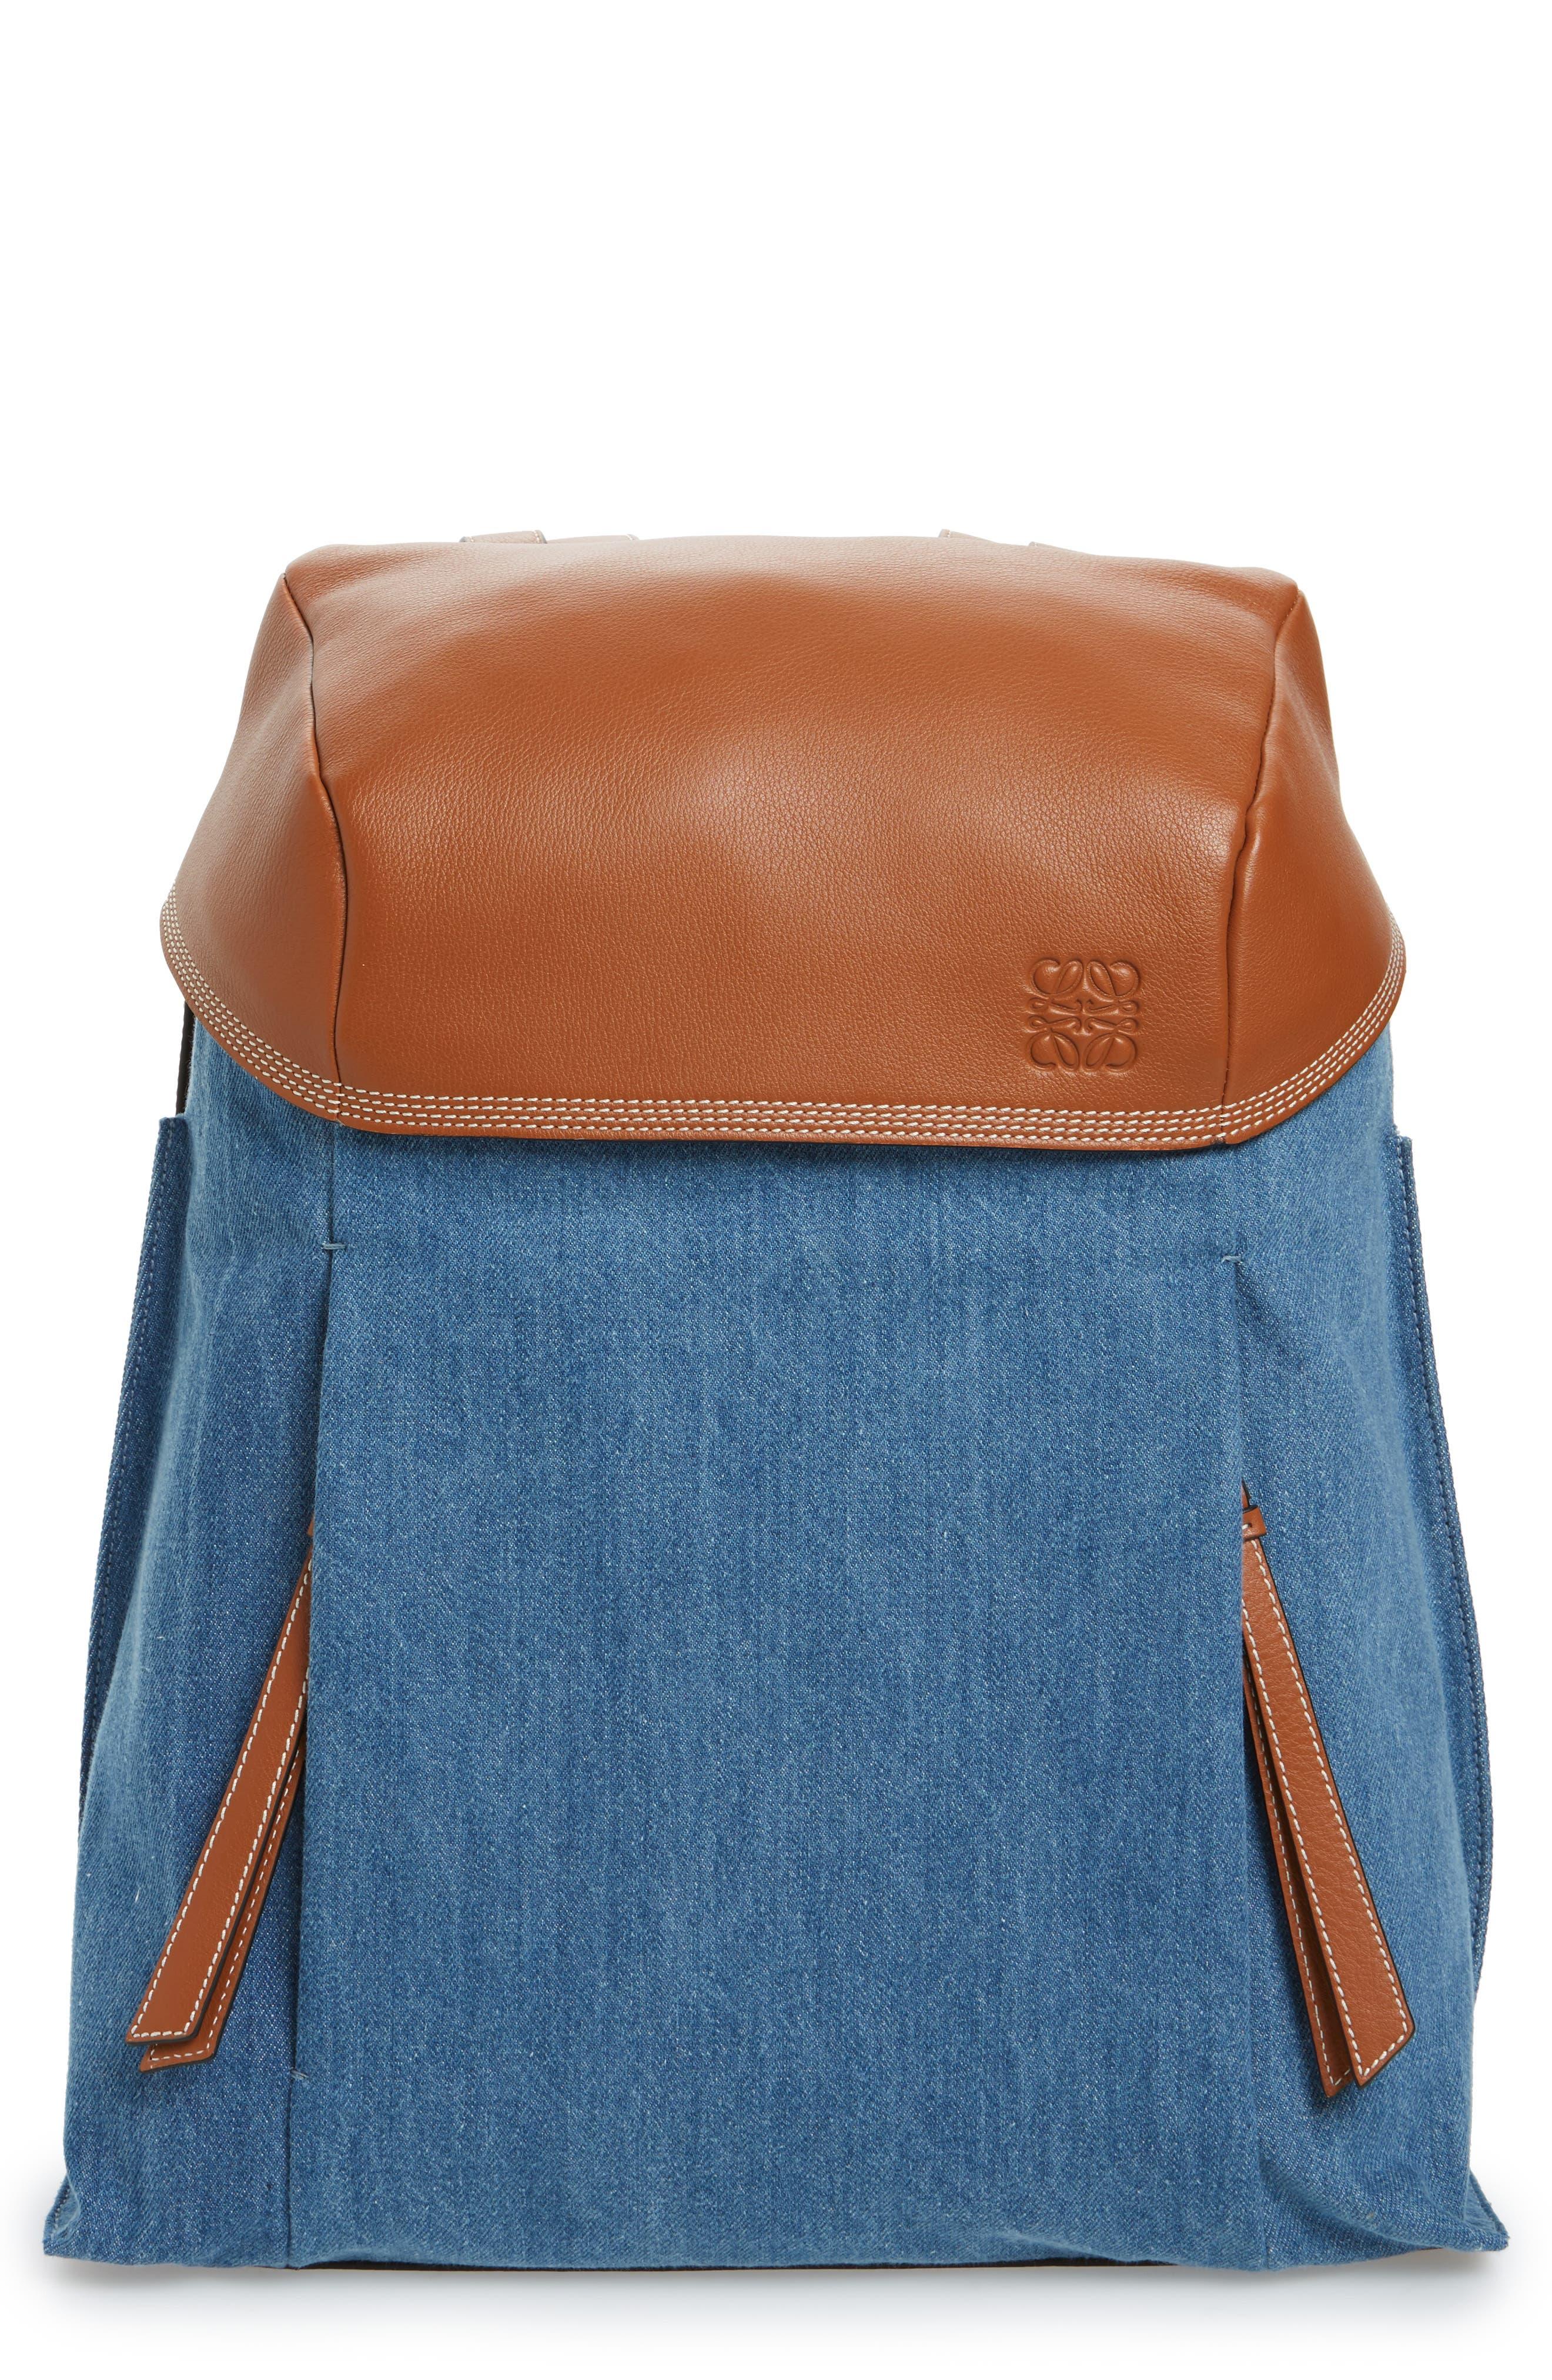 Main Image - Loewe T Small Denim & Leather Backpack